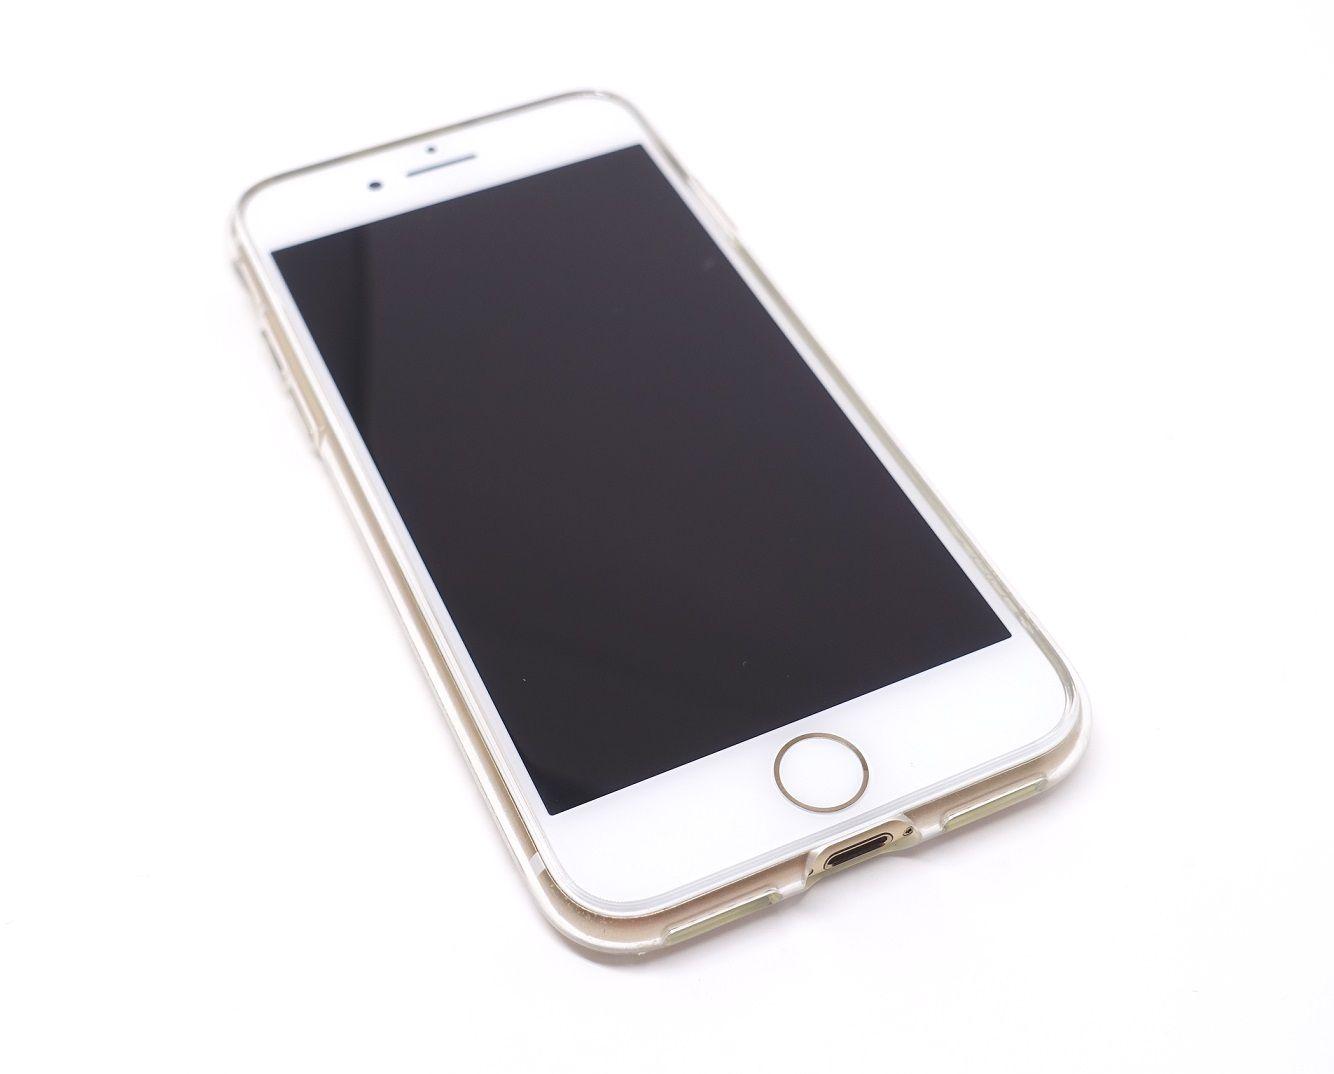 944ee7f505 Spigenの薄型軽量iPhone 7用ケース リキッド・クリスタル レビュー